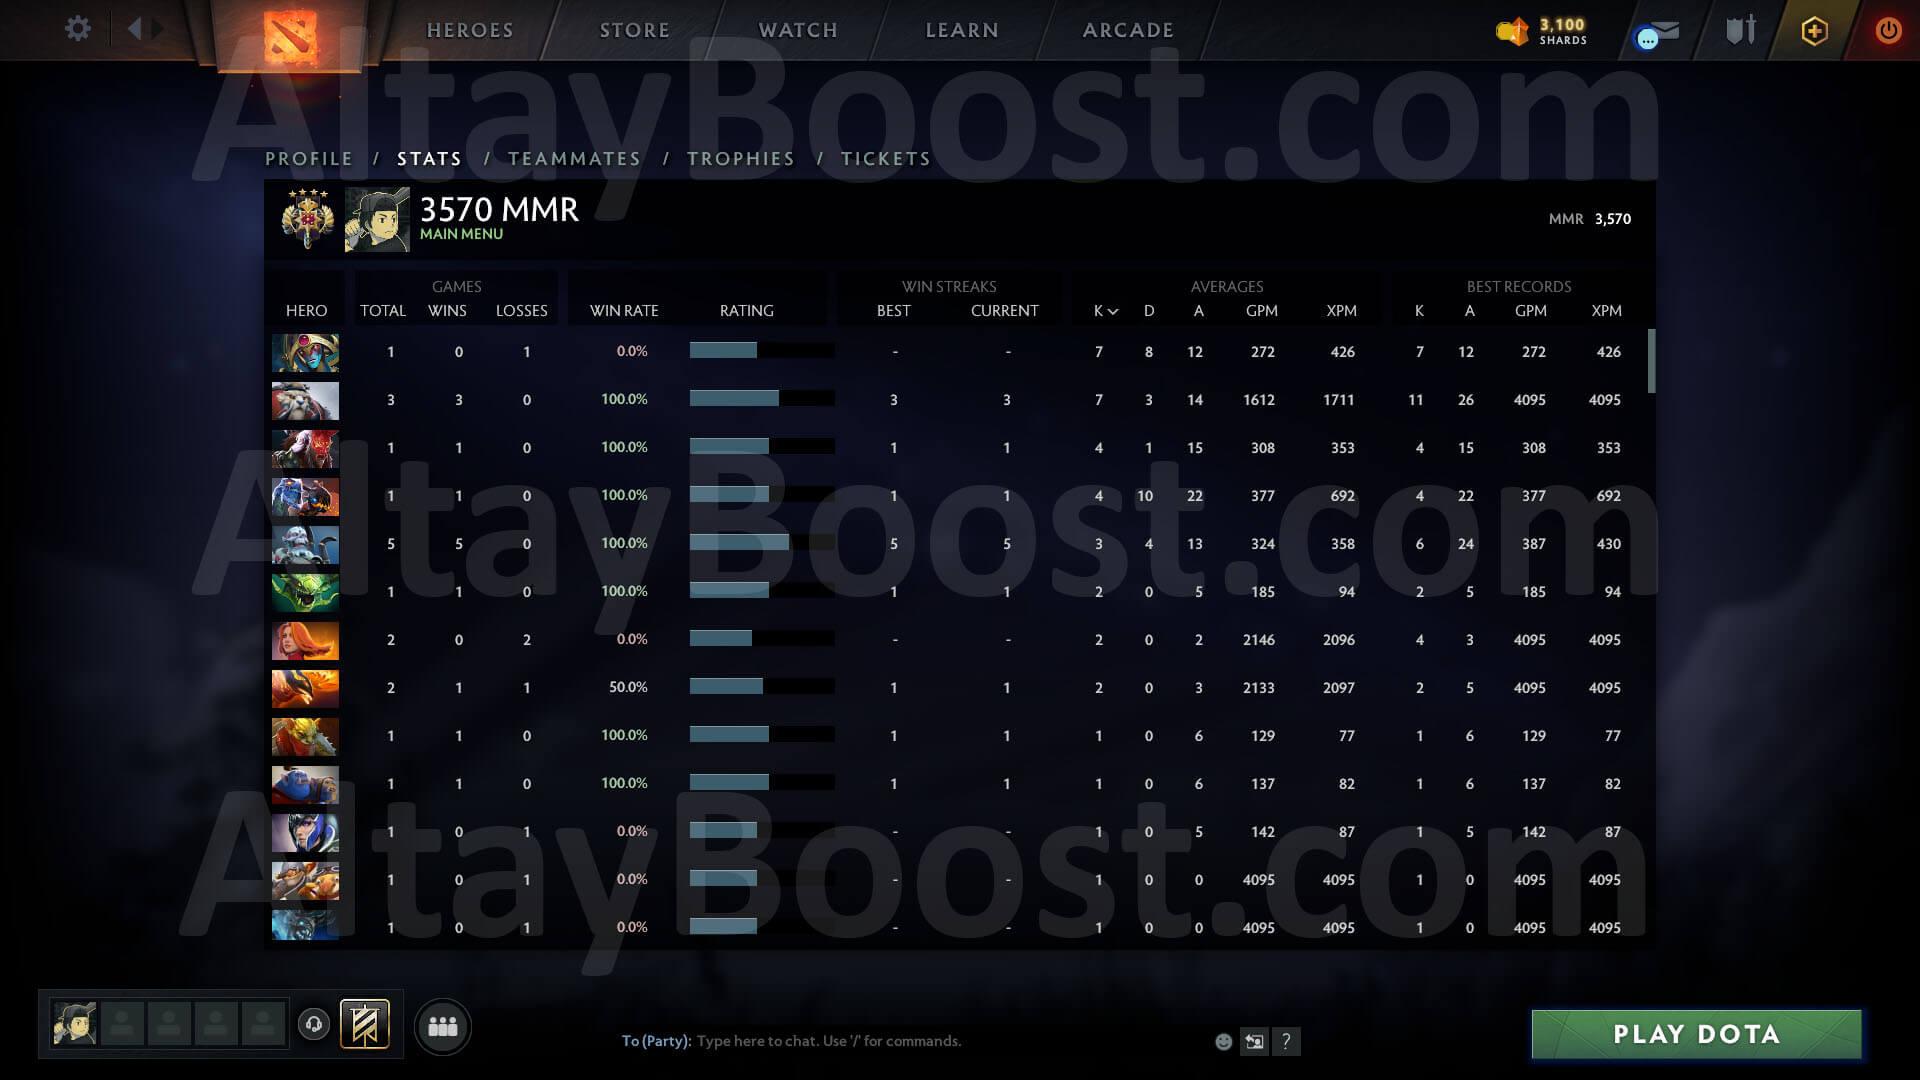 Dota medal 2 in mmr Matchmaking/Seasonal Rankings